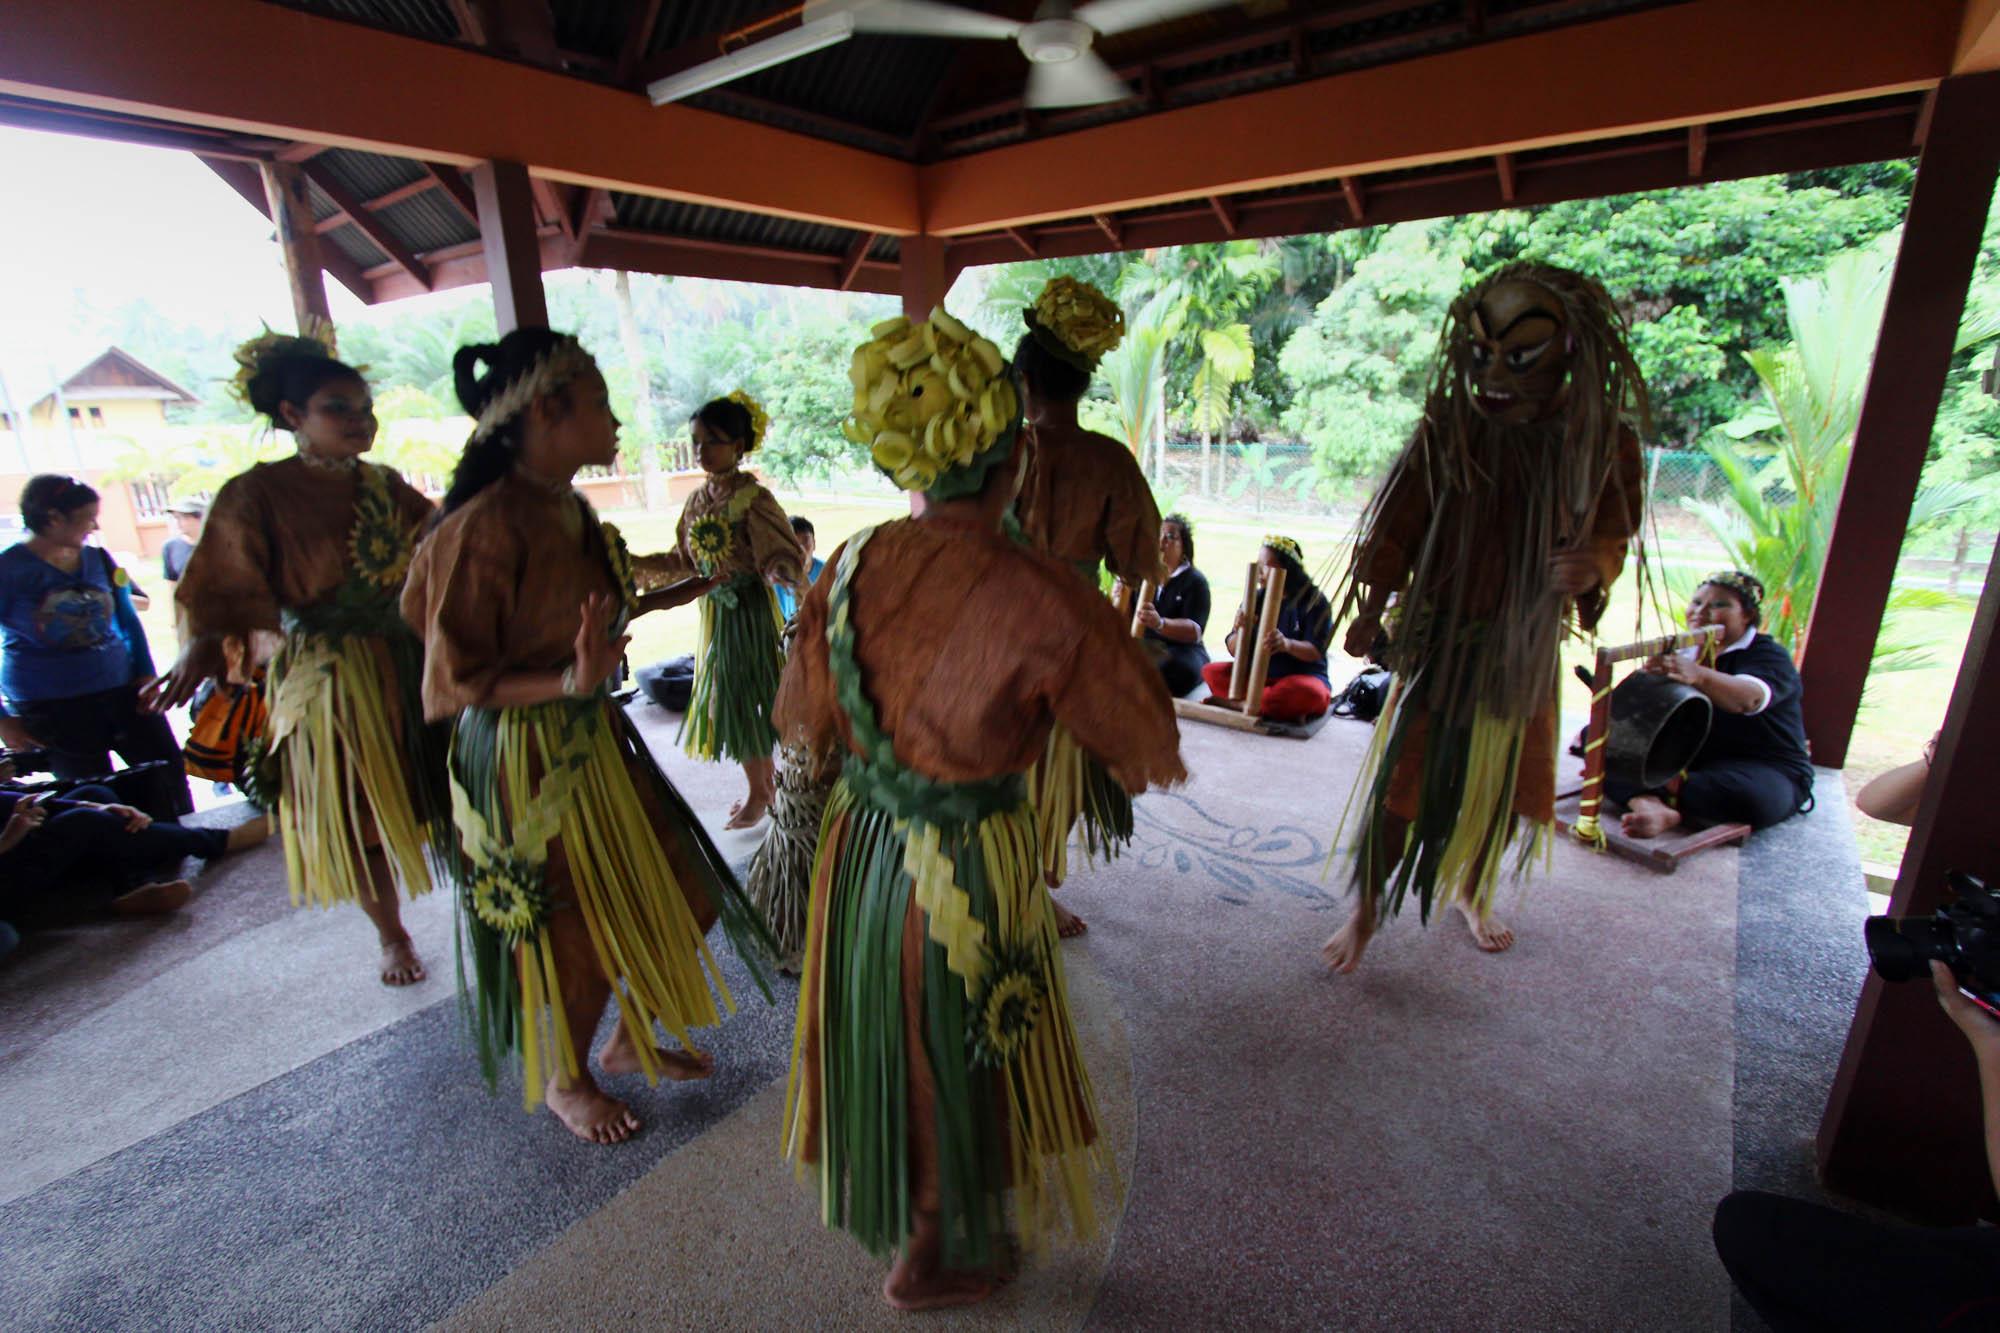 Mah Meri Cultural Village Carey Island From Malaysia To The World